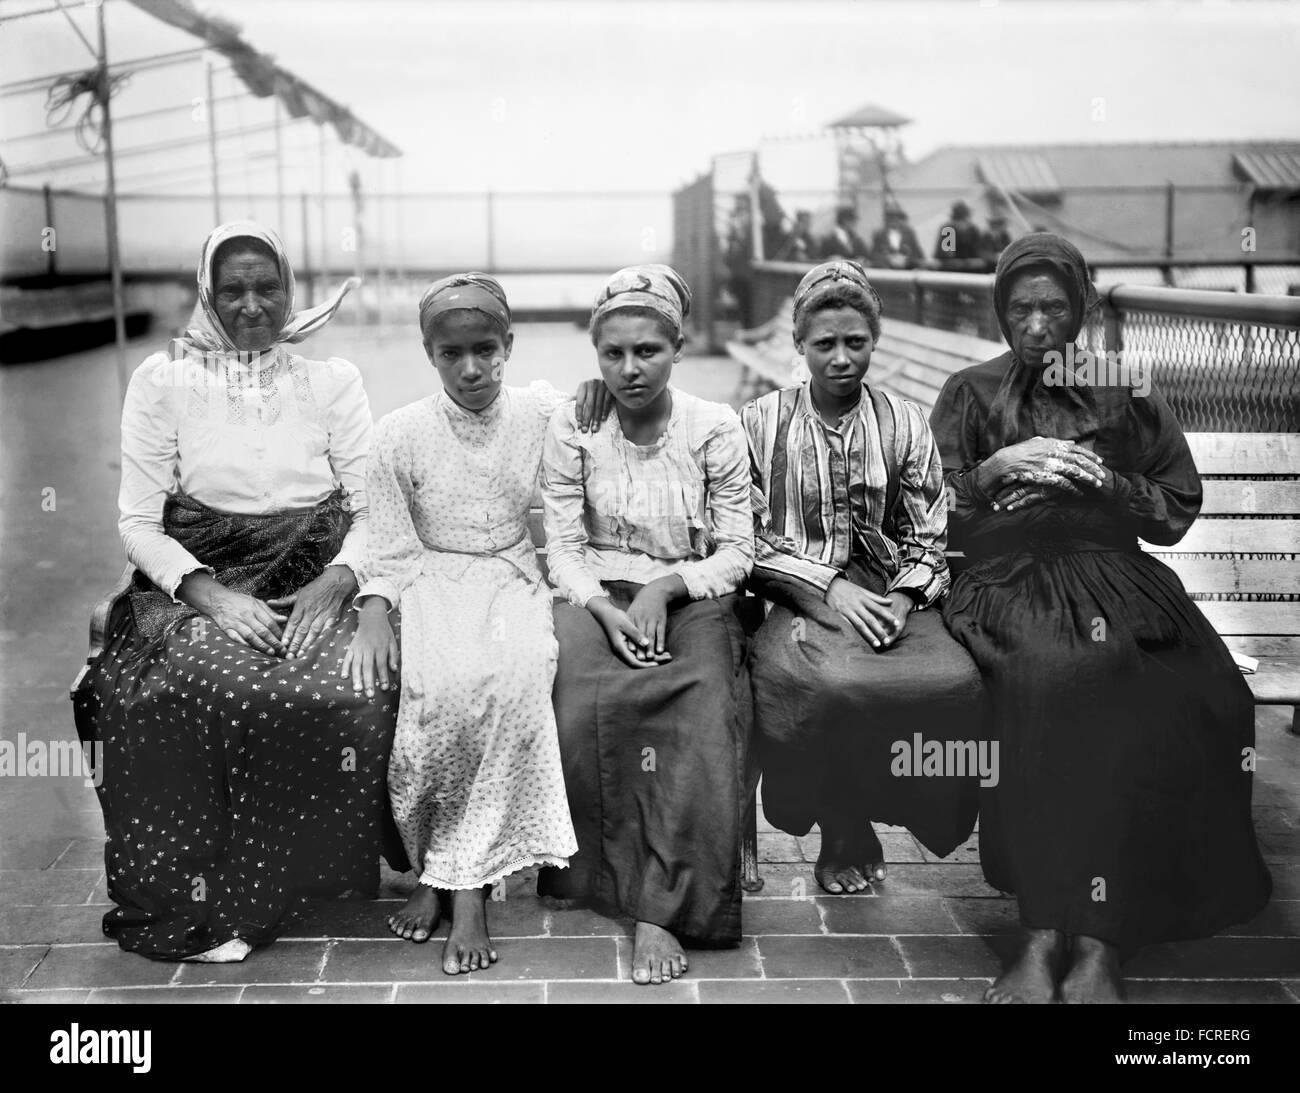 Immigrants at Ellis Island, New York, NY, early 20th century - Stock Image